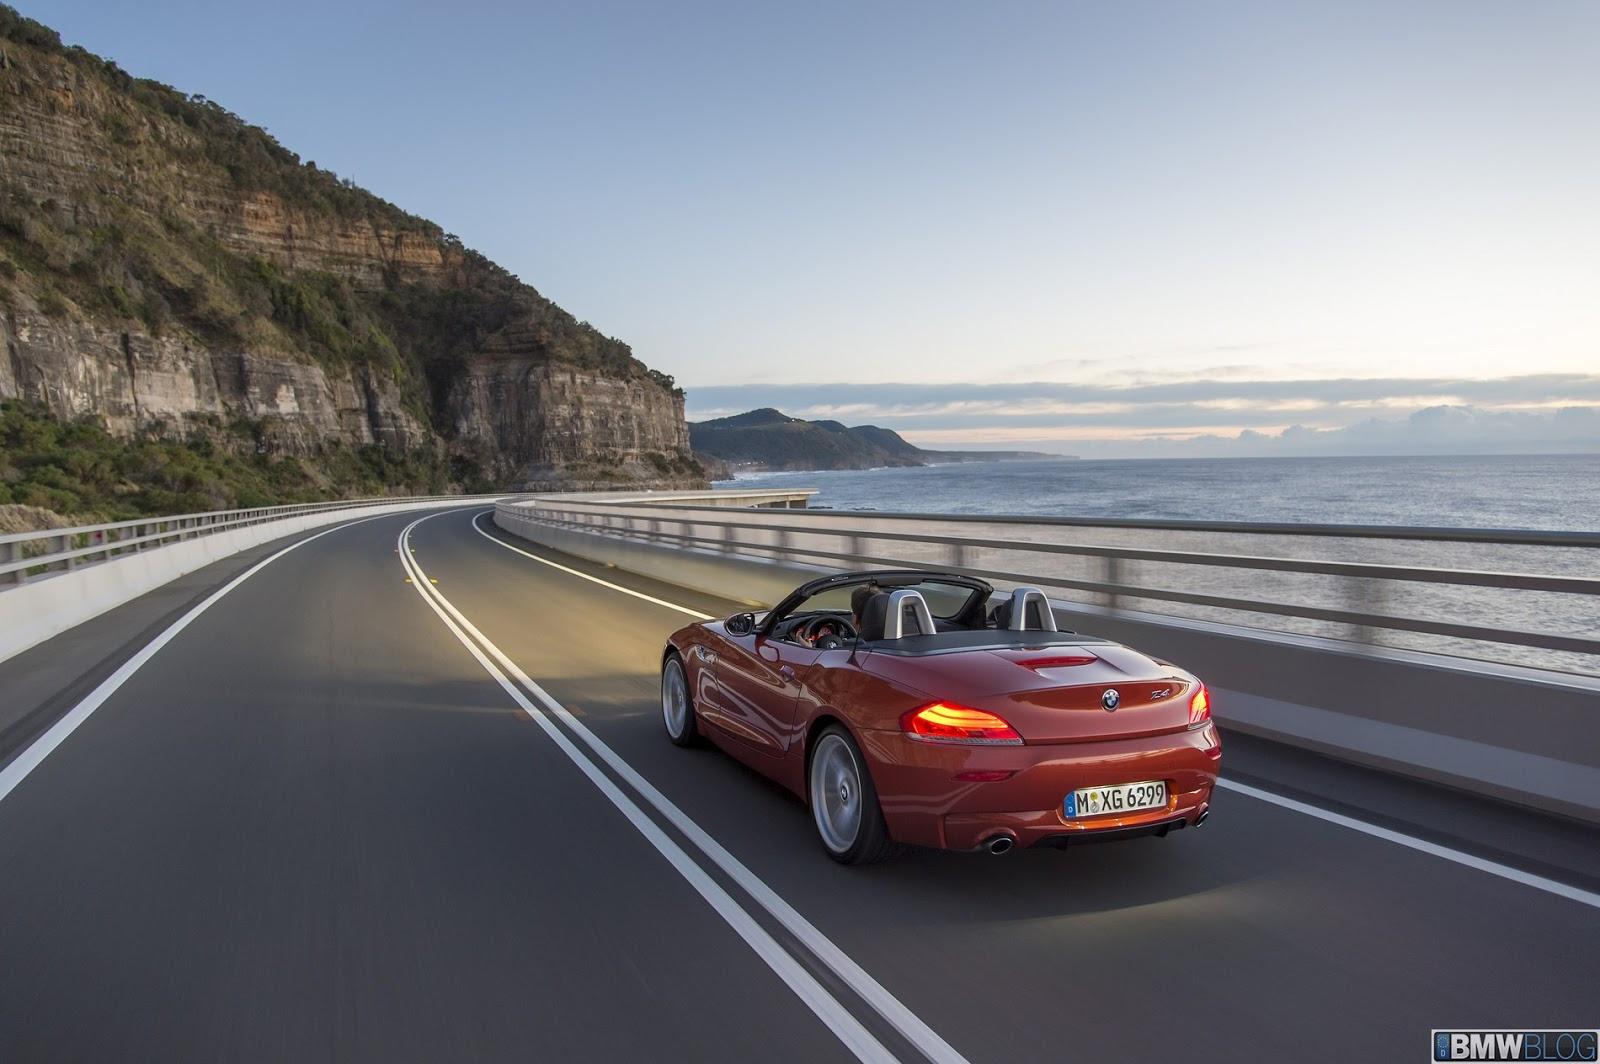 http://3.bp.blogspot.com/-XzUrEIK8PZk/UNANTLmaTkI/AAAAAAAAsJs/saBEMarmFgU/s1600/BMW+Z4+Roadster+2014+wallpaper-03.jpg